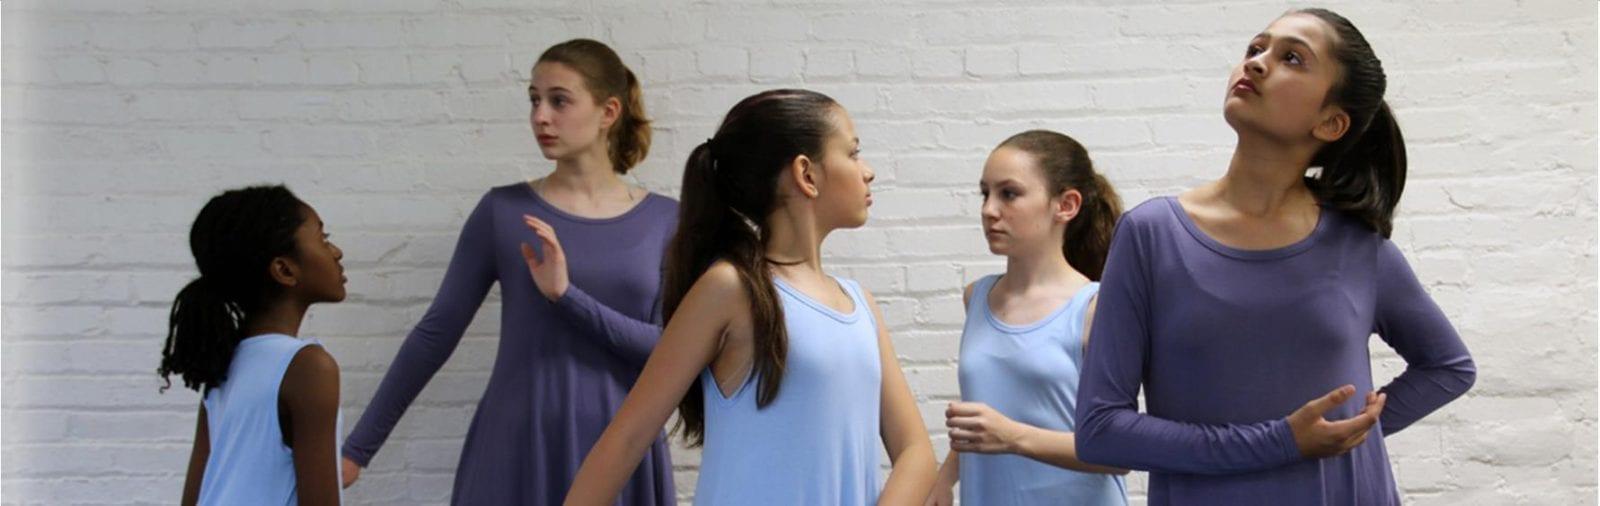 Dance Page Header Image2